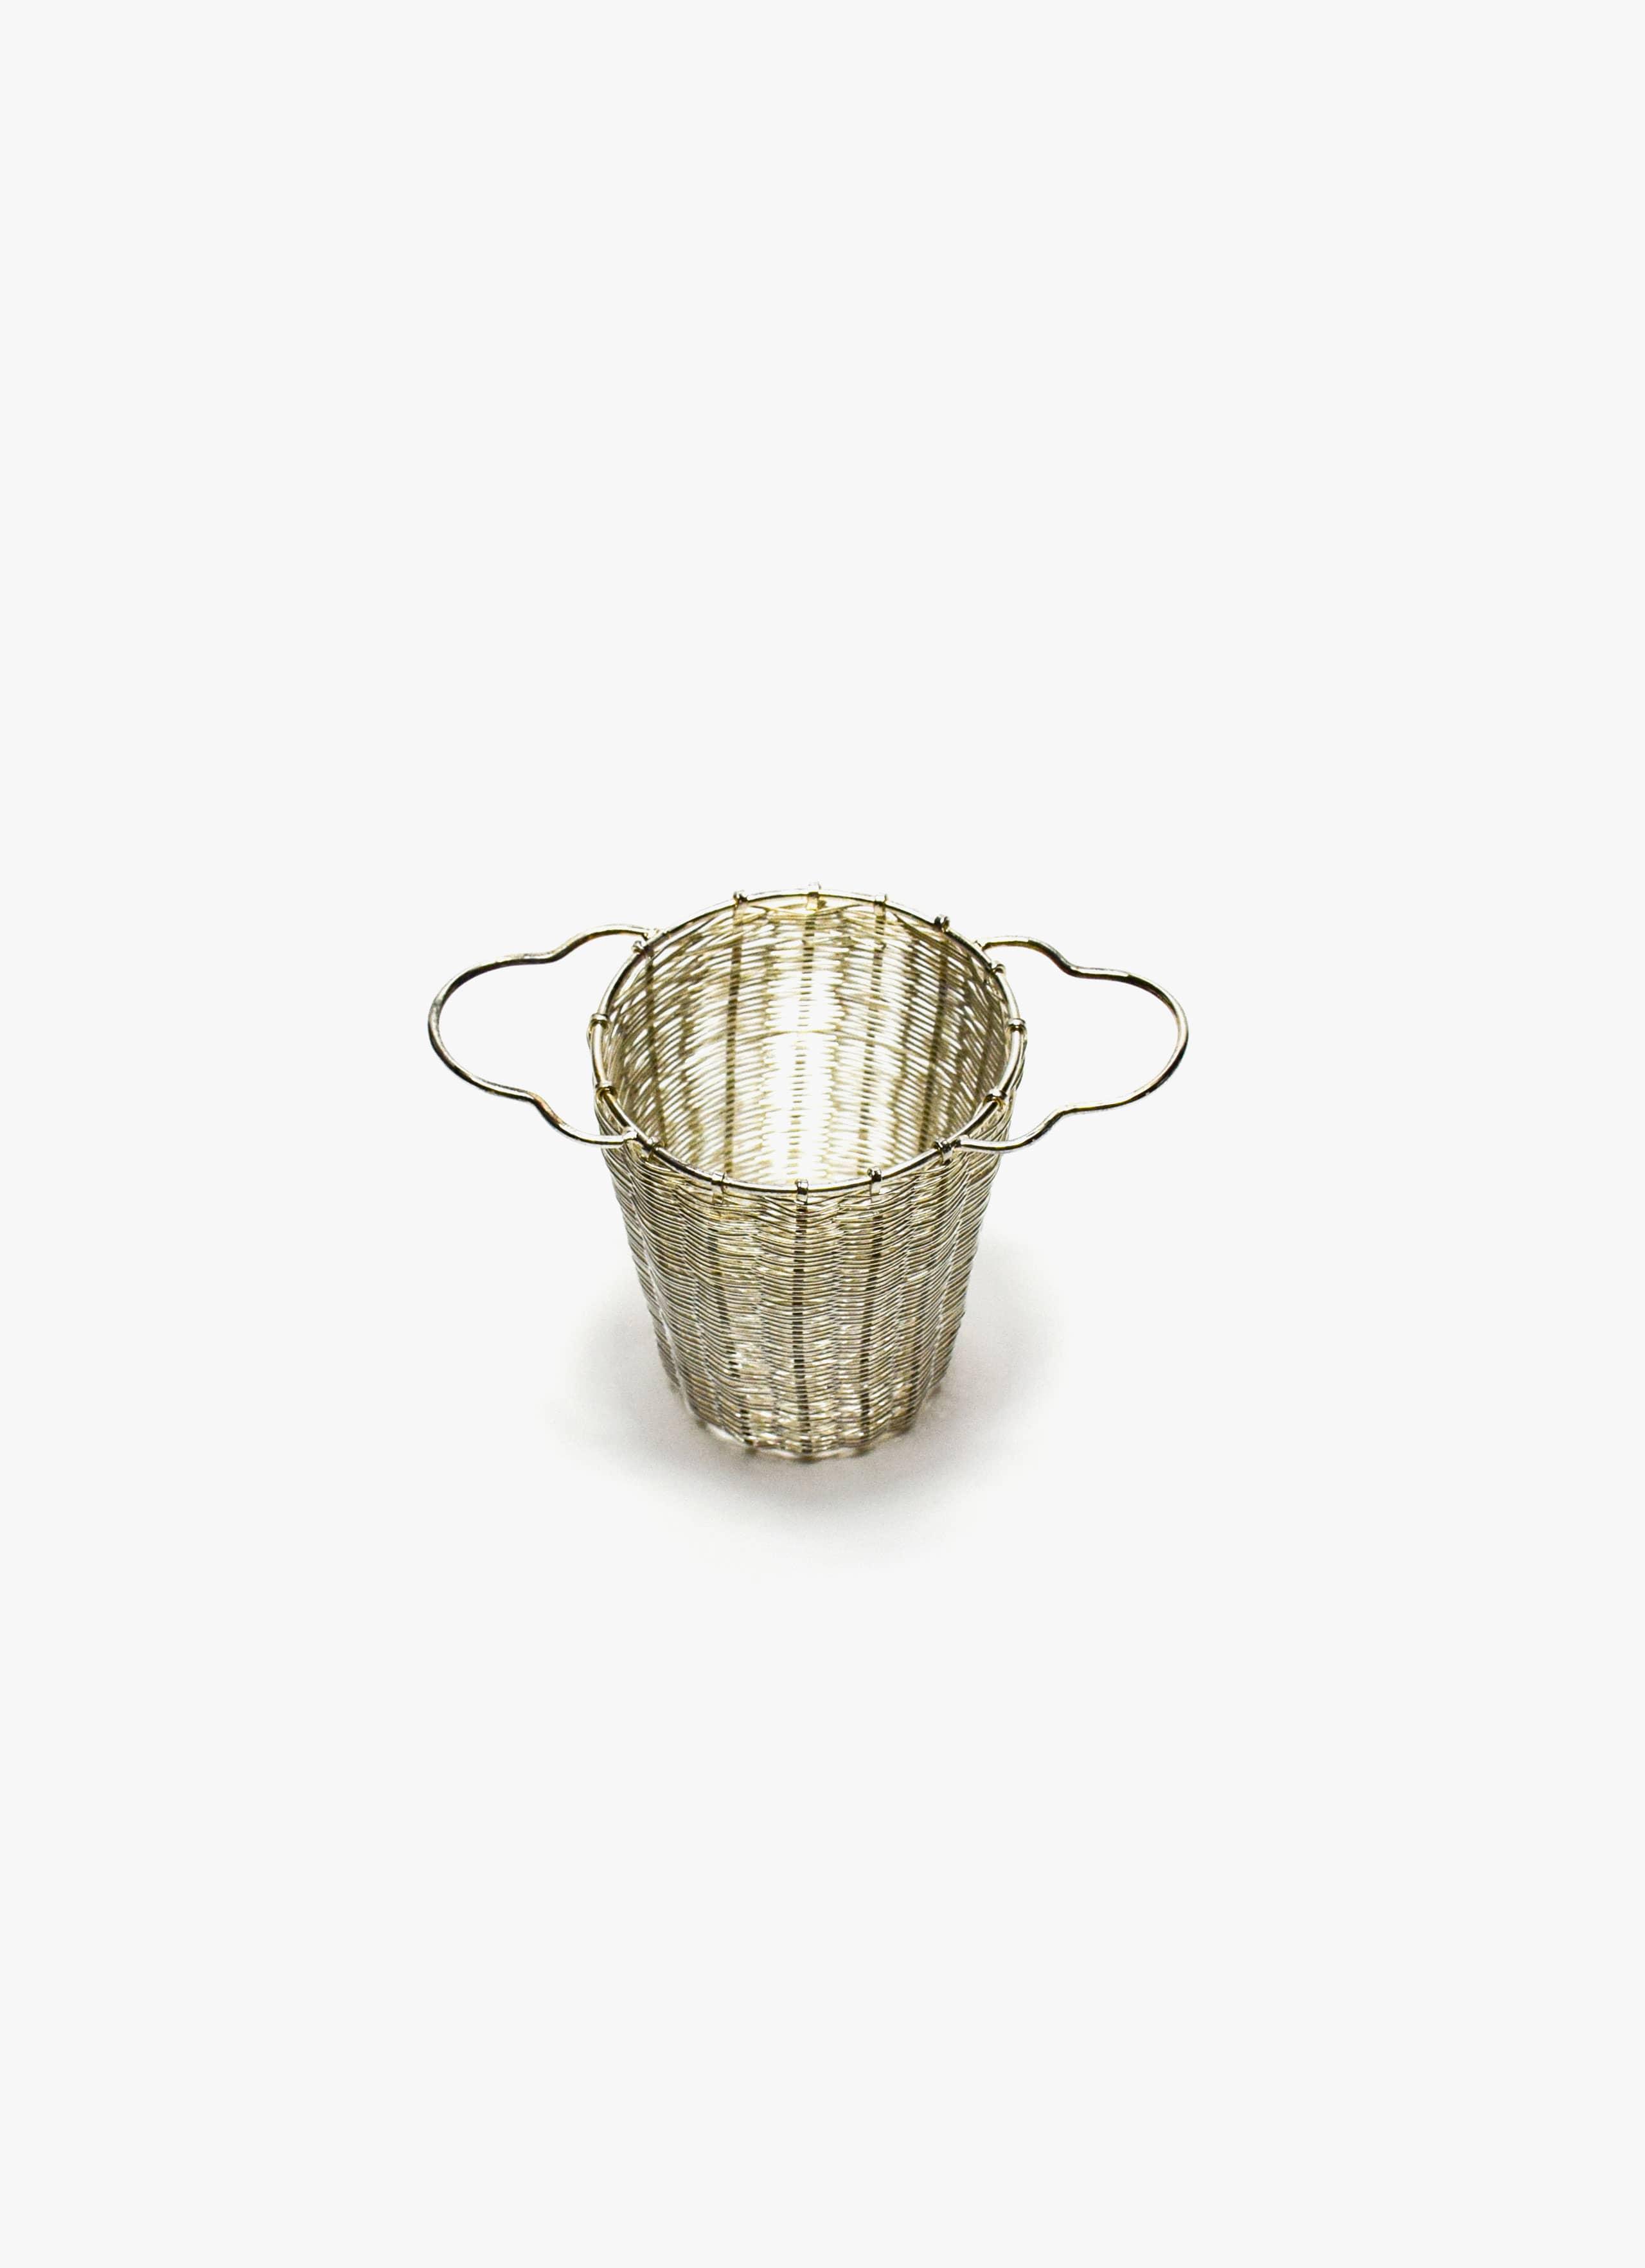 Bellocq - Tea Strainer - Deep Basket - Silver Plated Brass